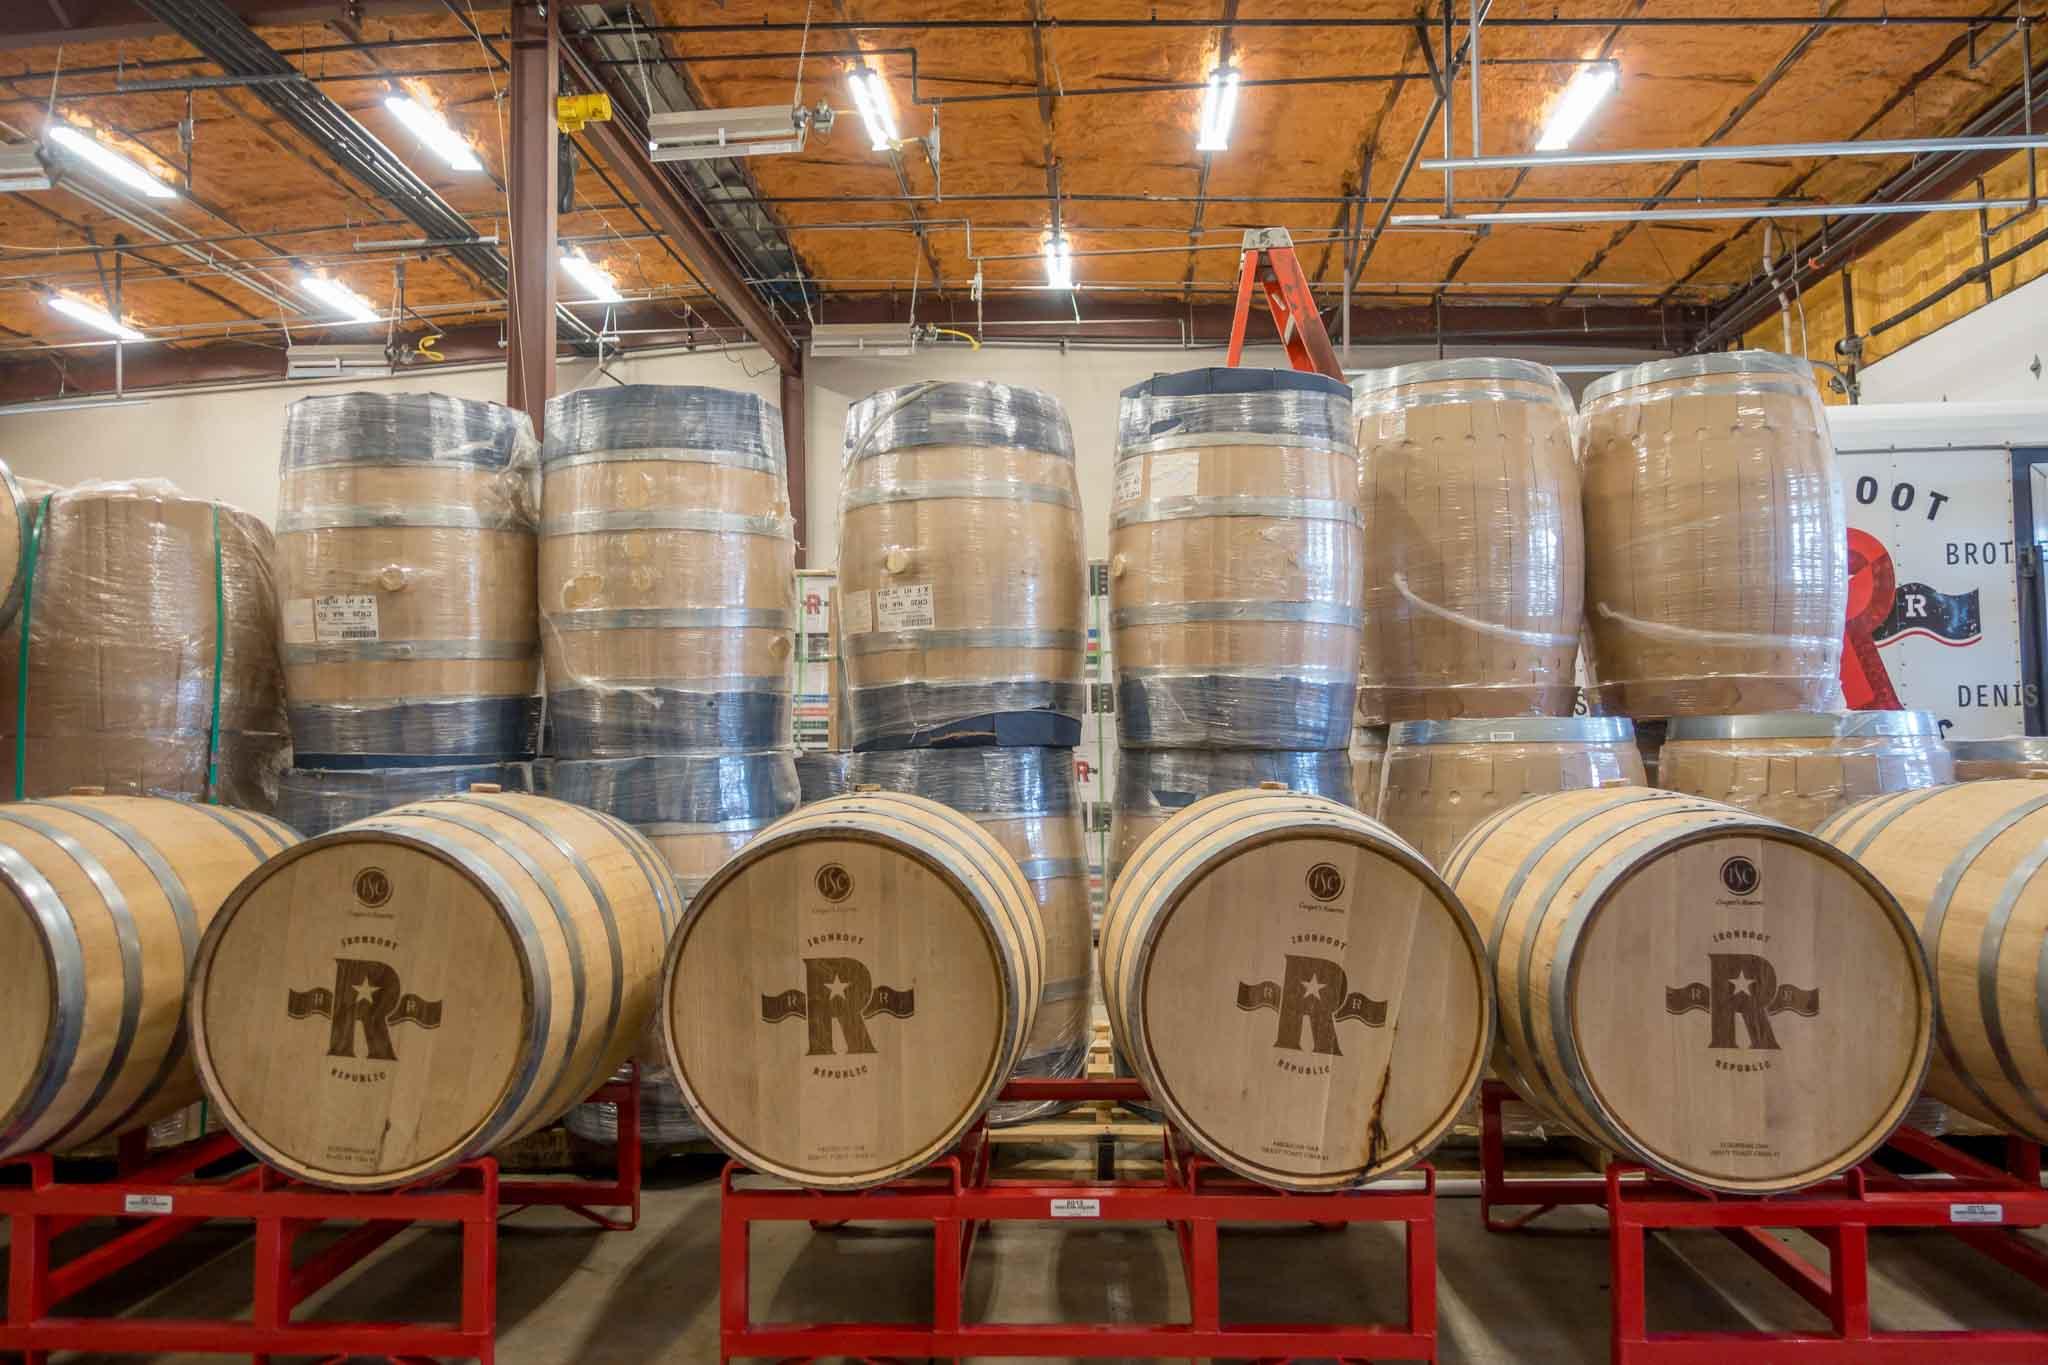 Barrels at Ironroot Republic Distillery in Denison, Texas